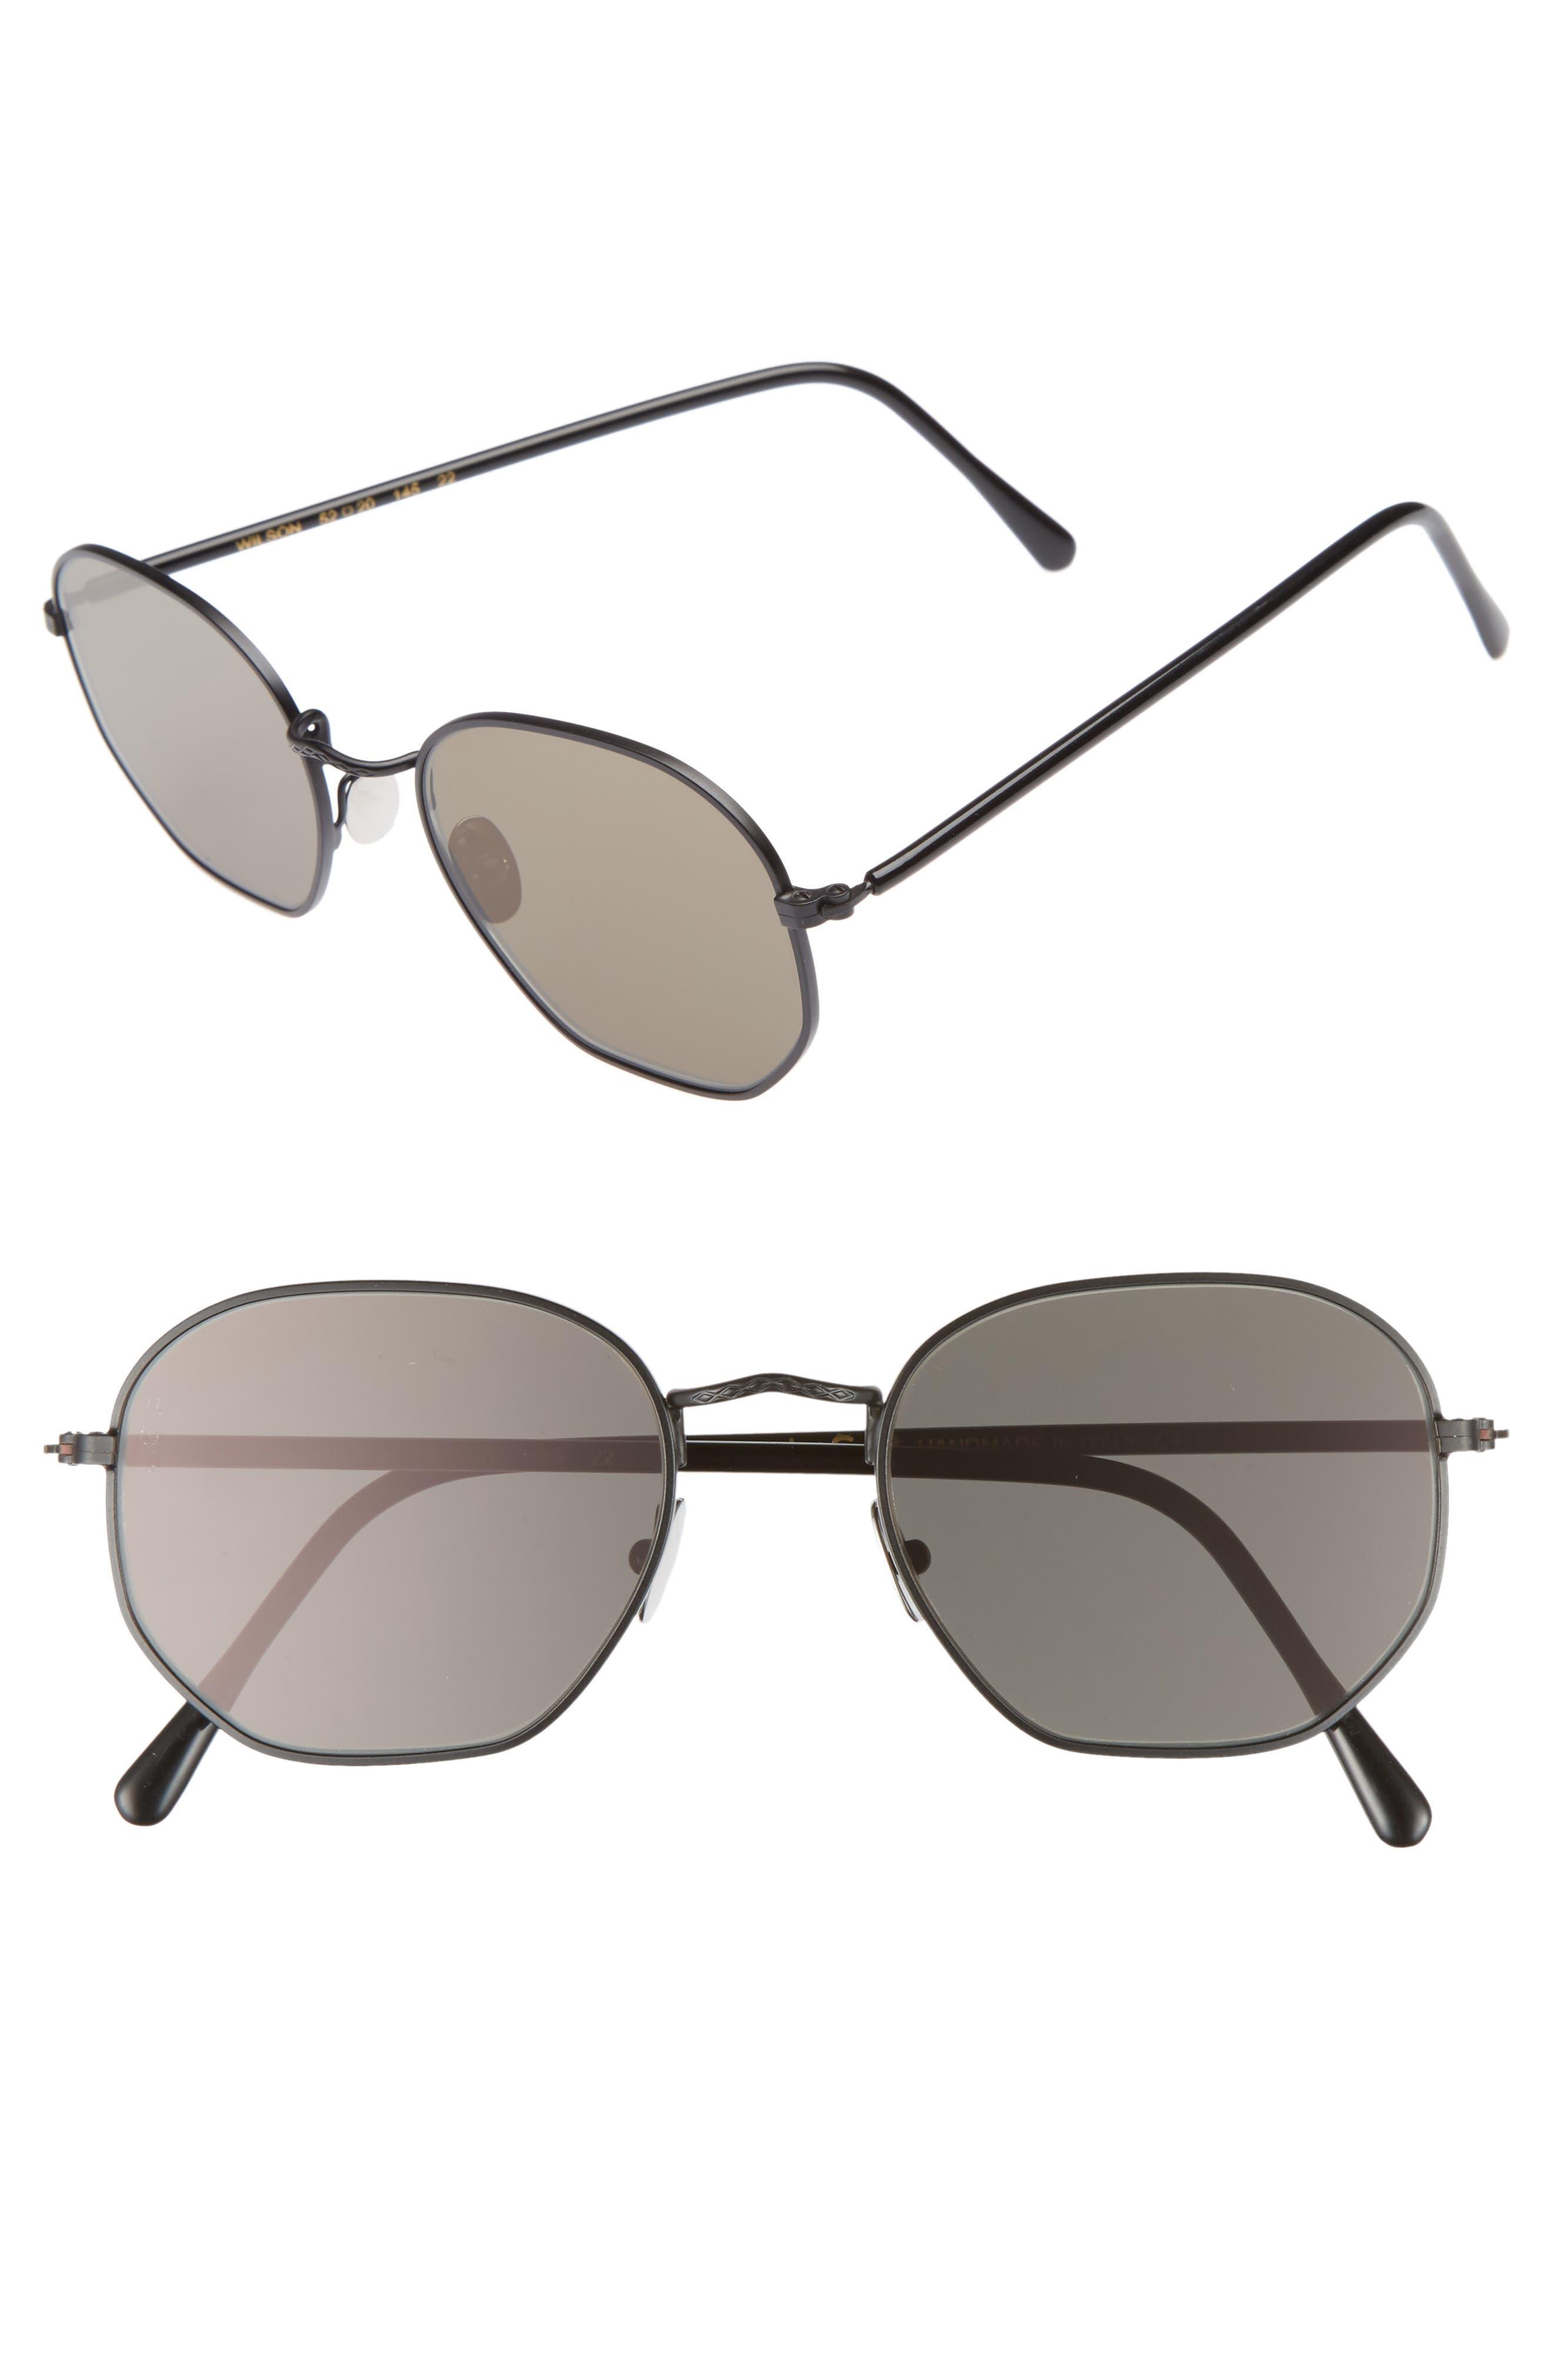 Wilson 52mm Sunglasses,                         Main,                         color, Black Matte/ Grey